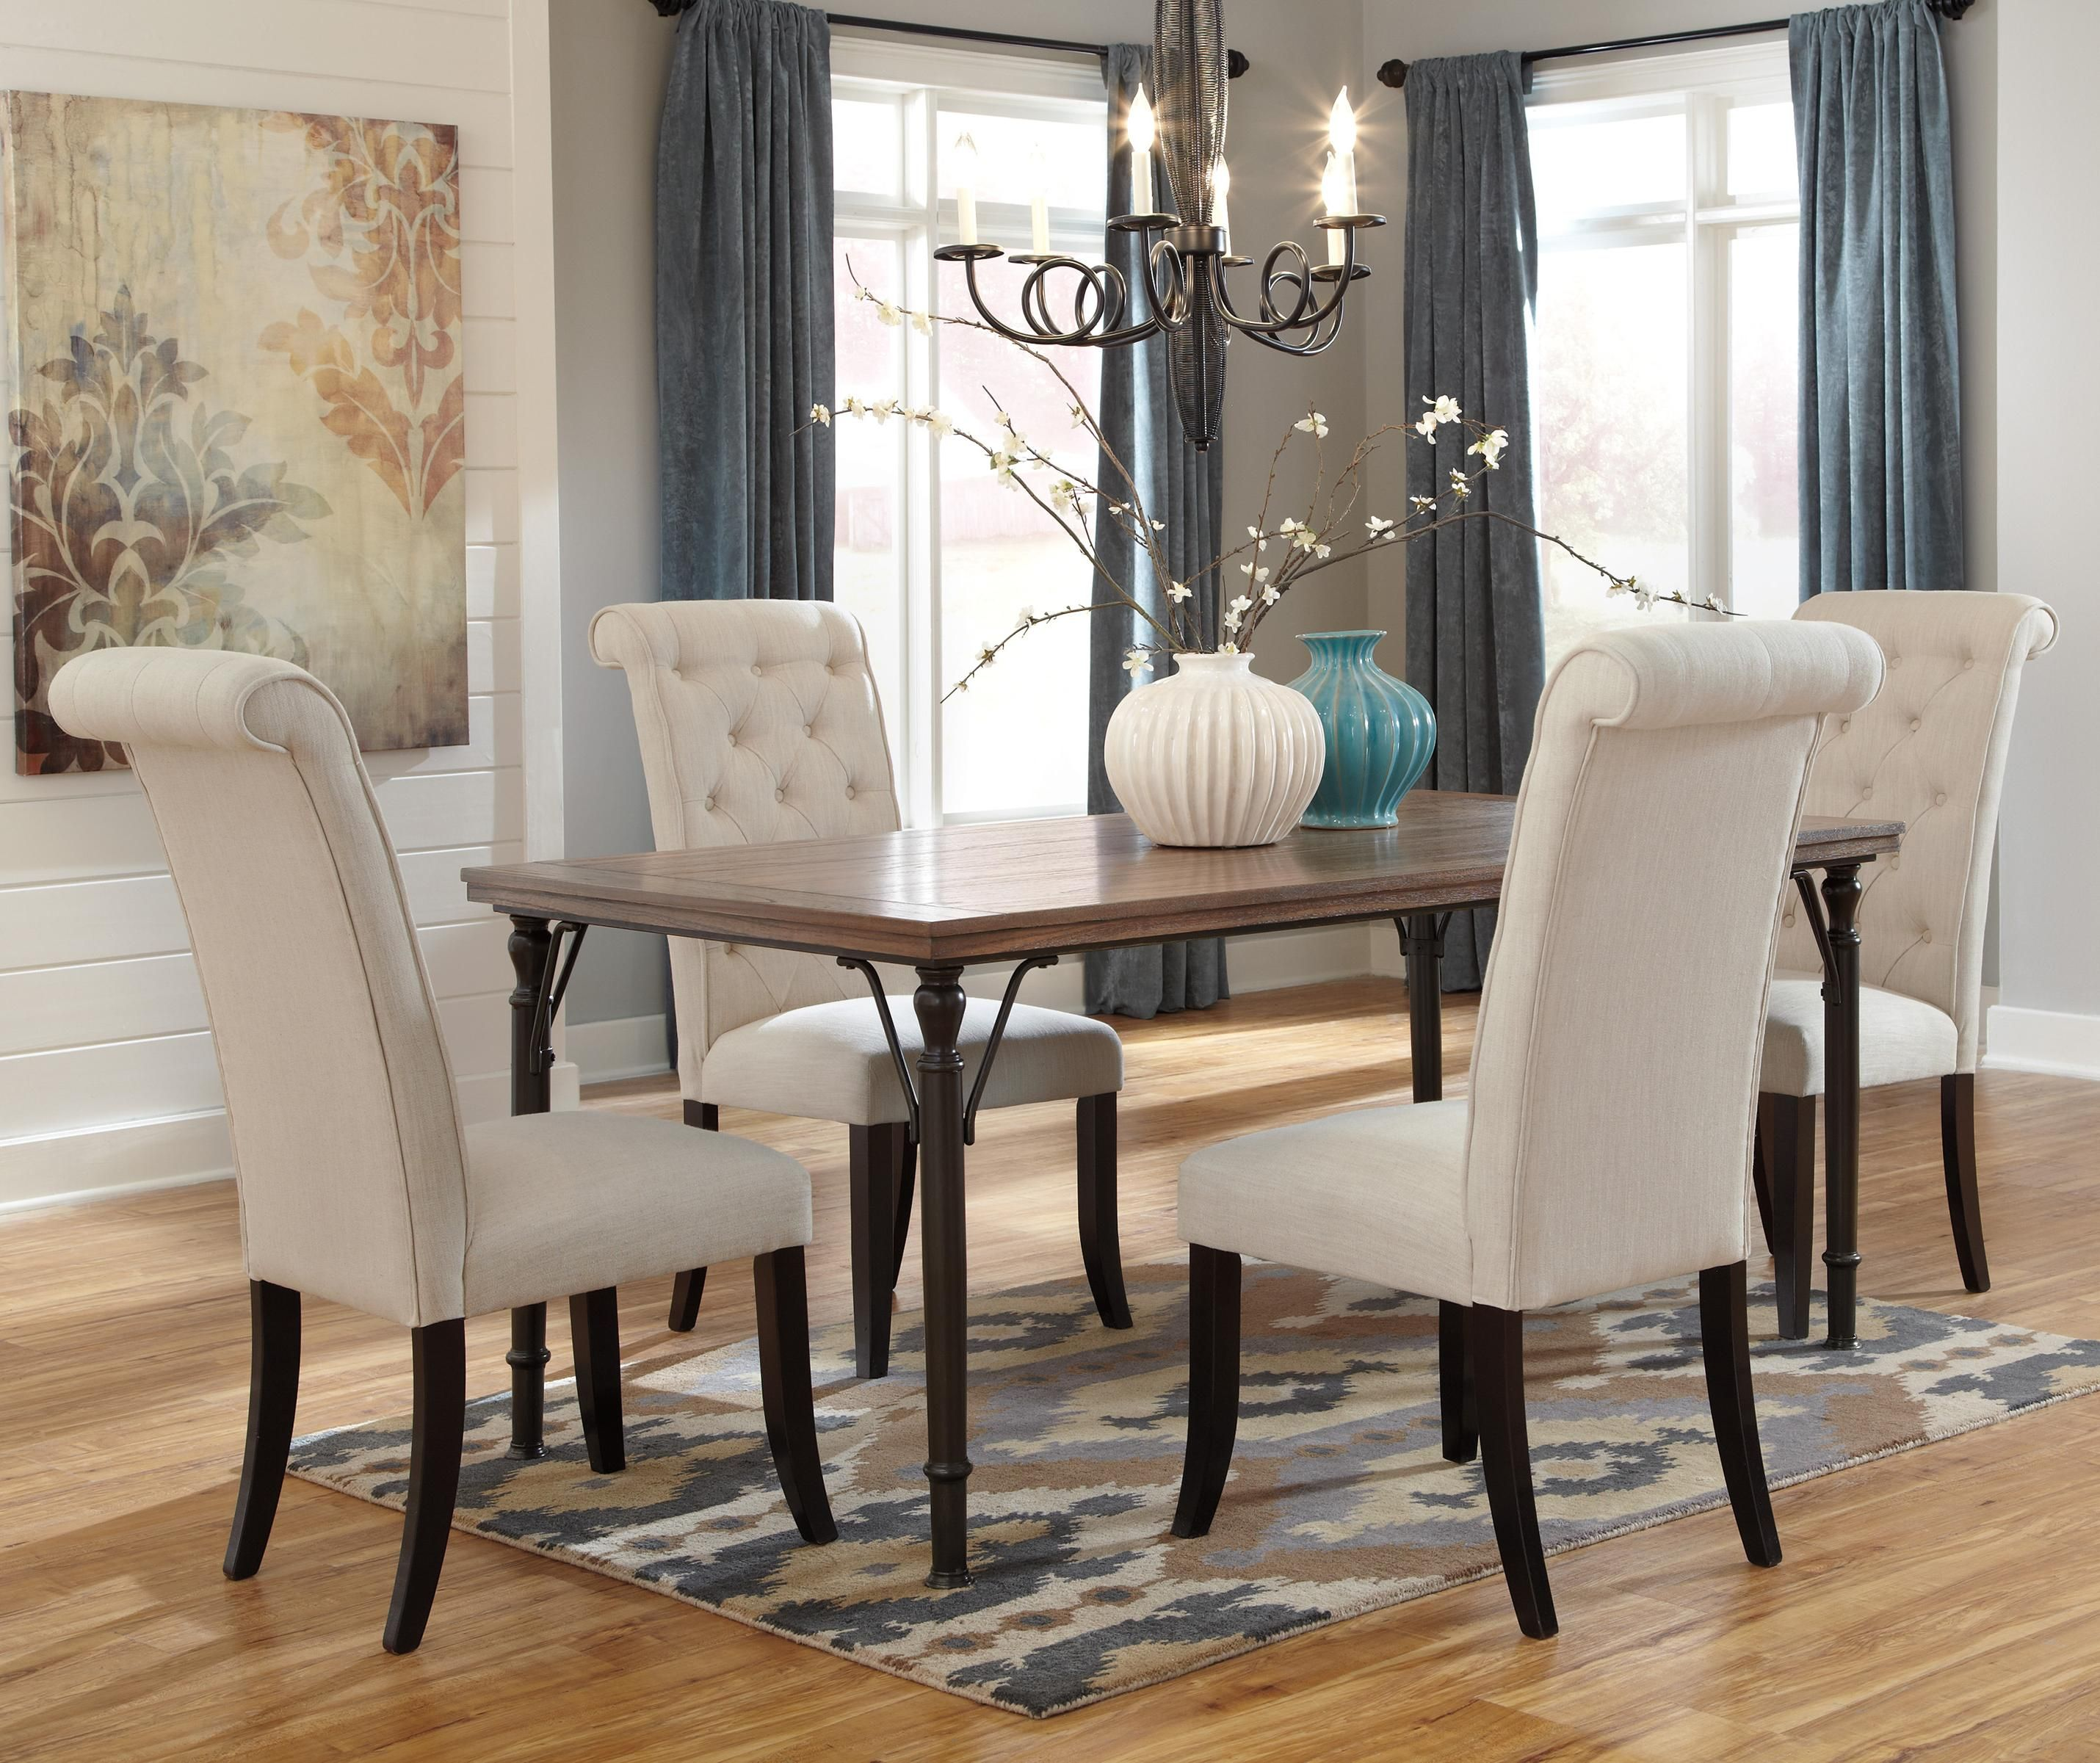 Tripton 5Piece Rectangular Dining Room Table Setsignature Inspiration Best Dining Room Set Design Ideas